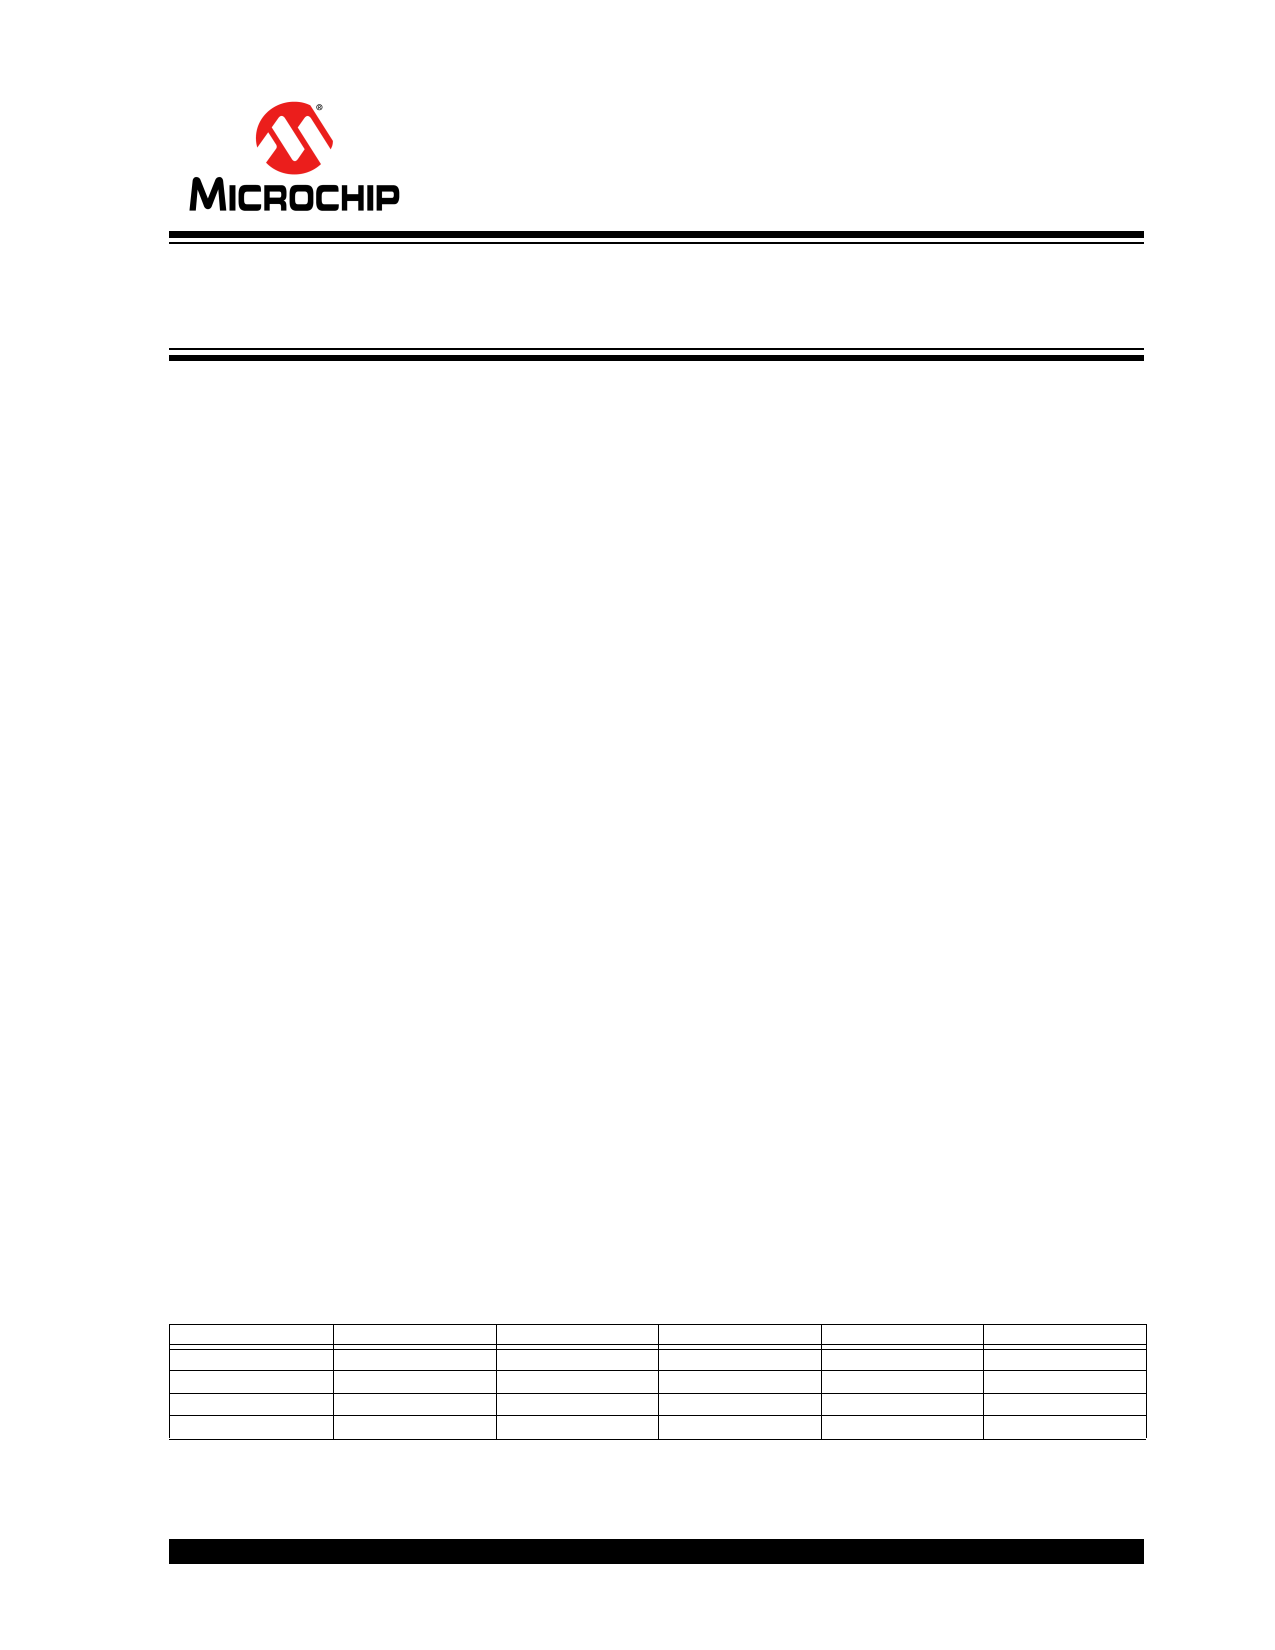 PIC24HJ128GP204 데이터시트 및 PIC24HJ128GP204 PDF